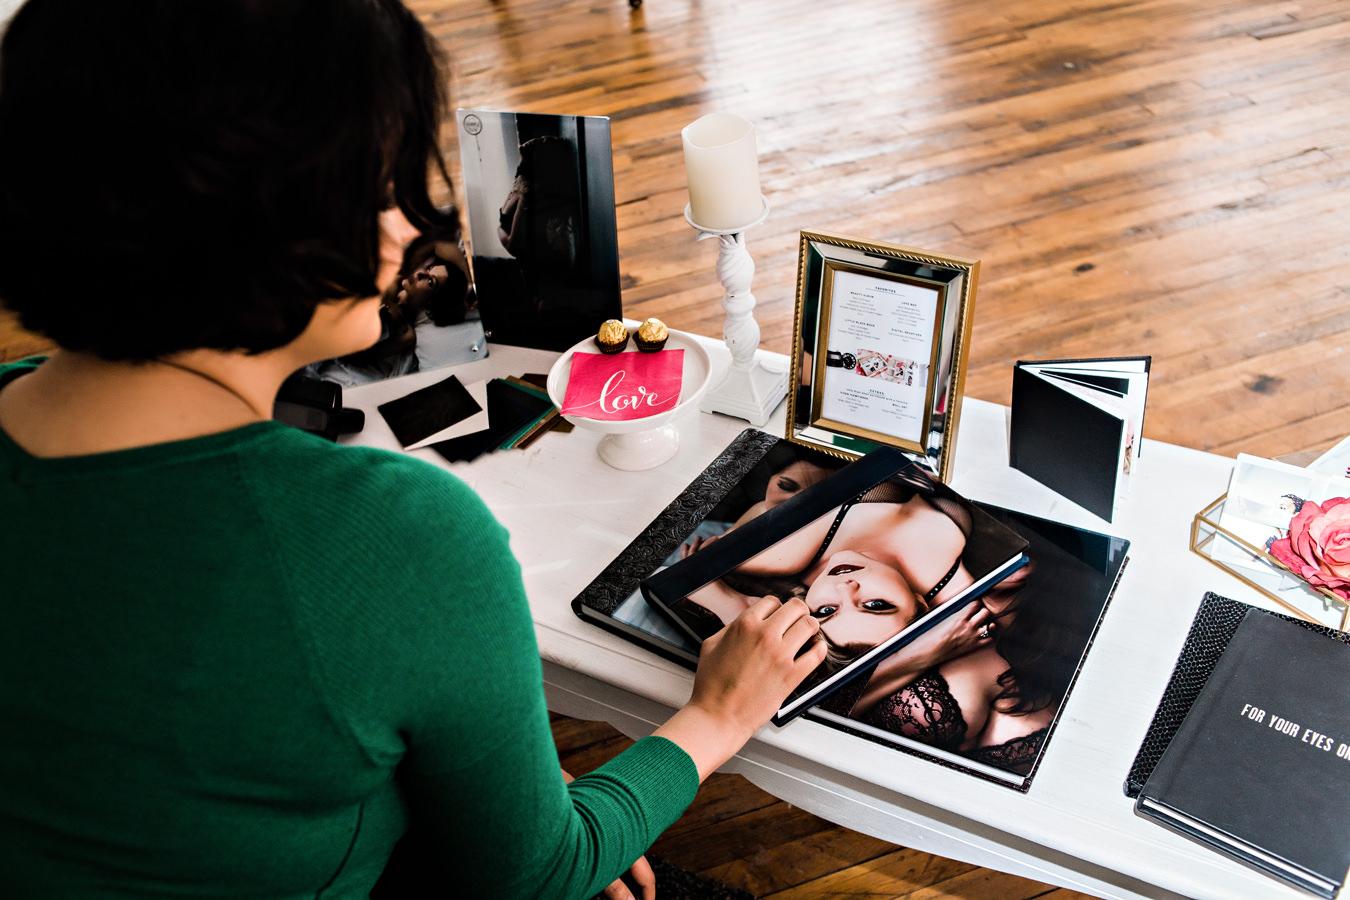 Boudoir-Photographer-Michelle-Burroughs-Michigan-Boudoir-Photography-Studio-Space